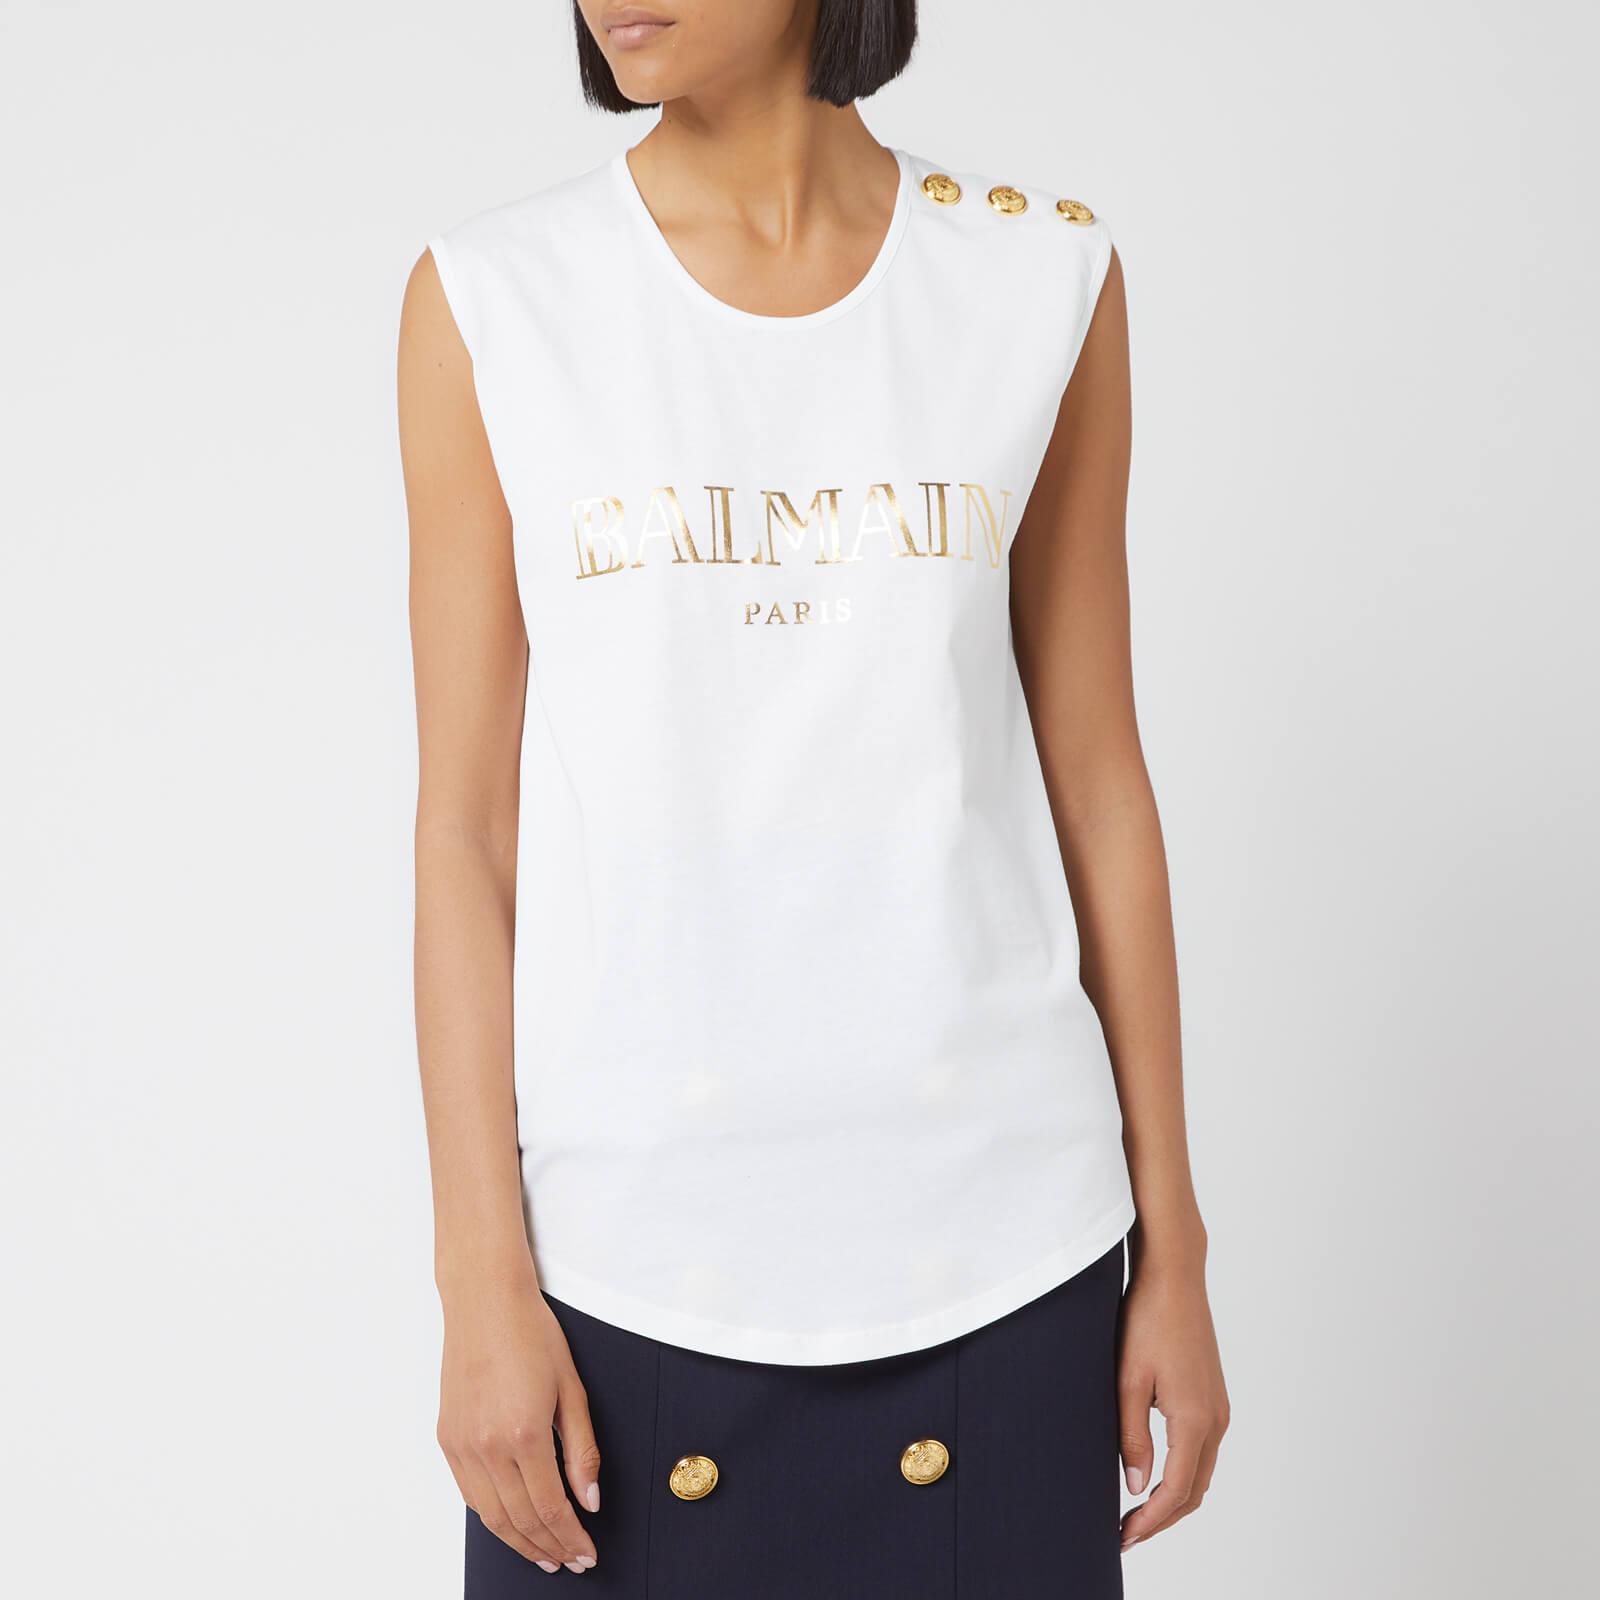 76591a9cbd1 Balmain Women's Logo Tank Top - White/Gold - Free UK Delivery over £50